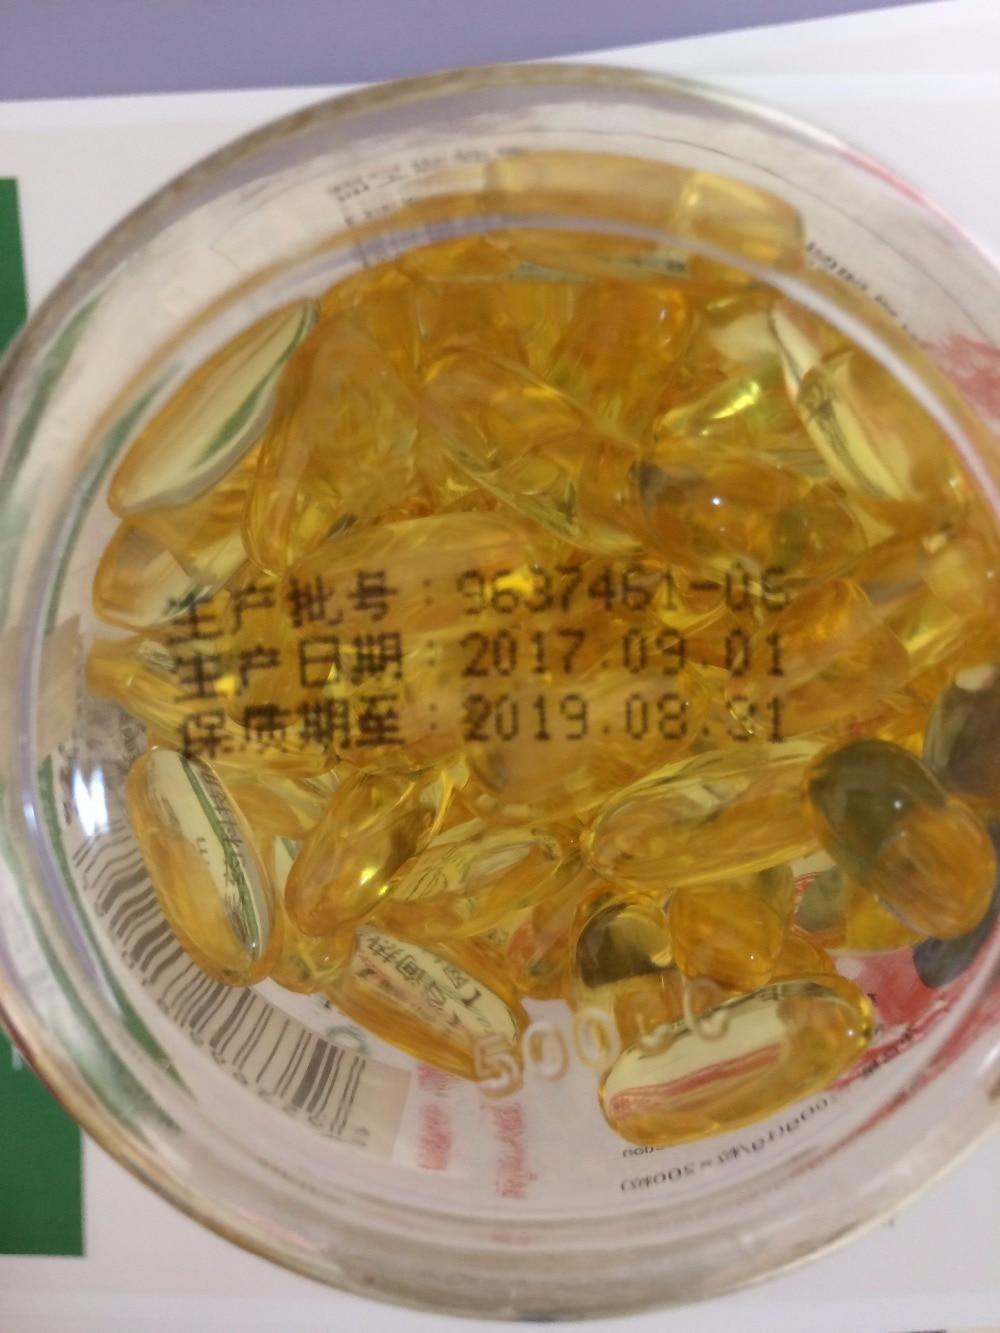 NEW Package 1000mg*200 Bottle Deep Sea Fish O-OILOmega (3) DHA & EPA Supplement Sports Nutrition digital playground stoya s deep sea adventures rabbit